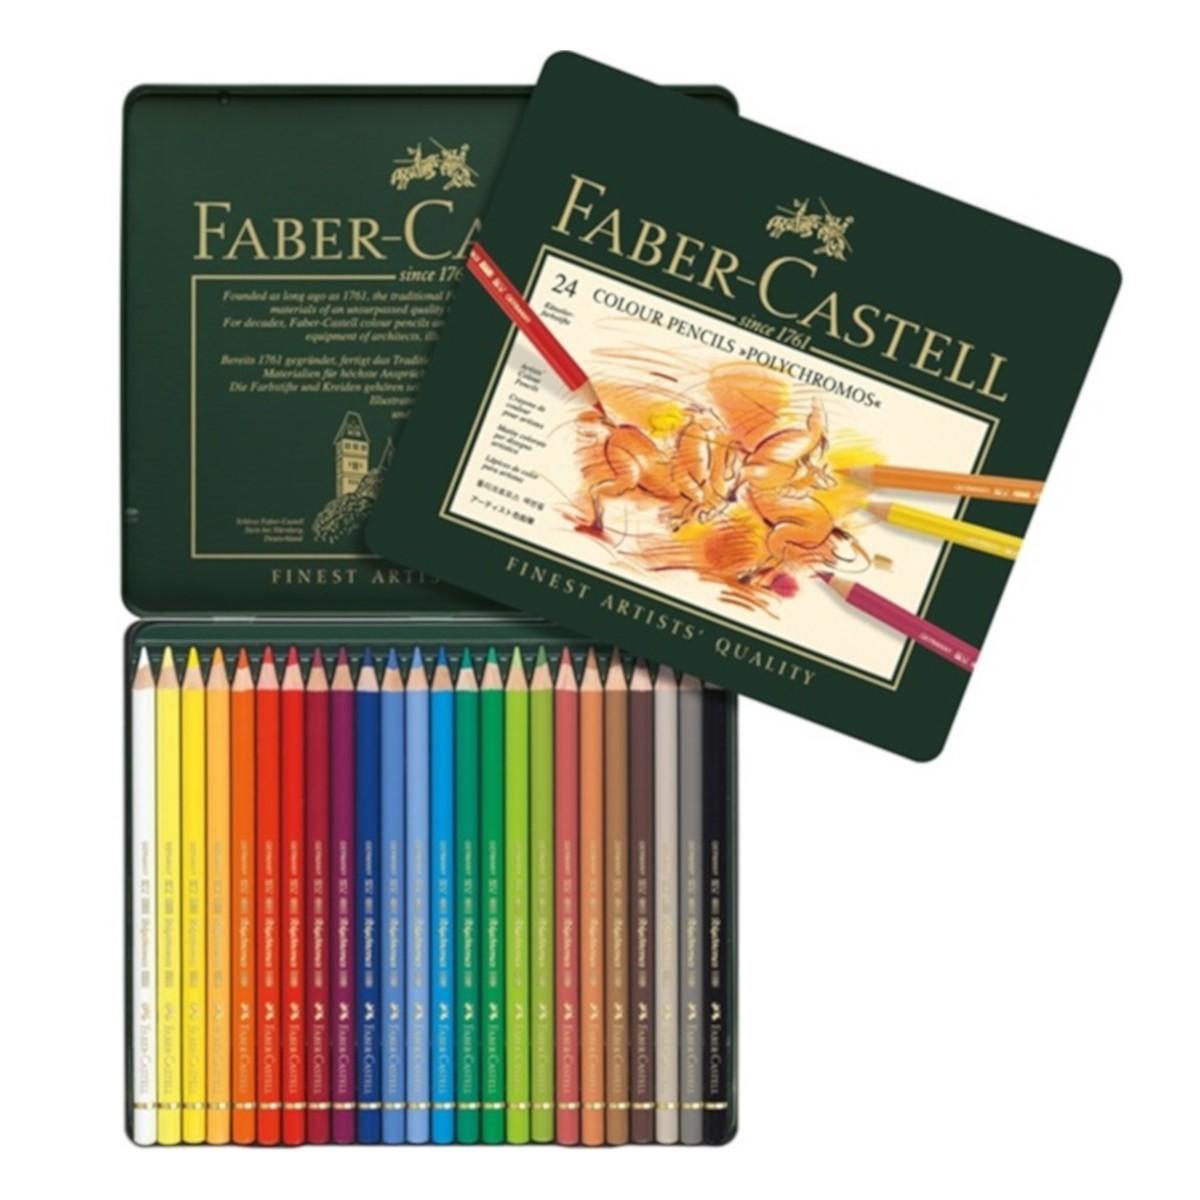 FaberCastellFarveblyanterPolychromosst-01